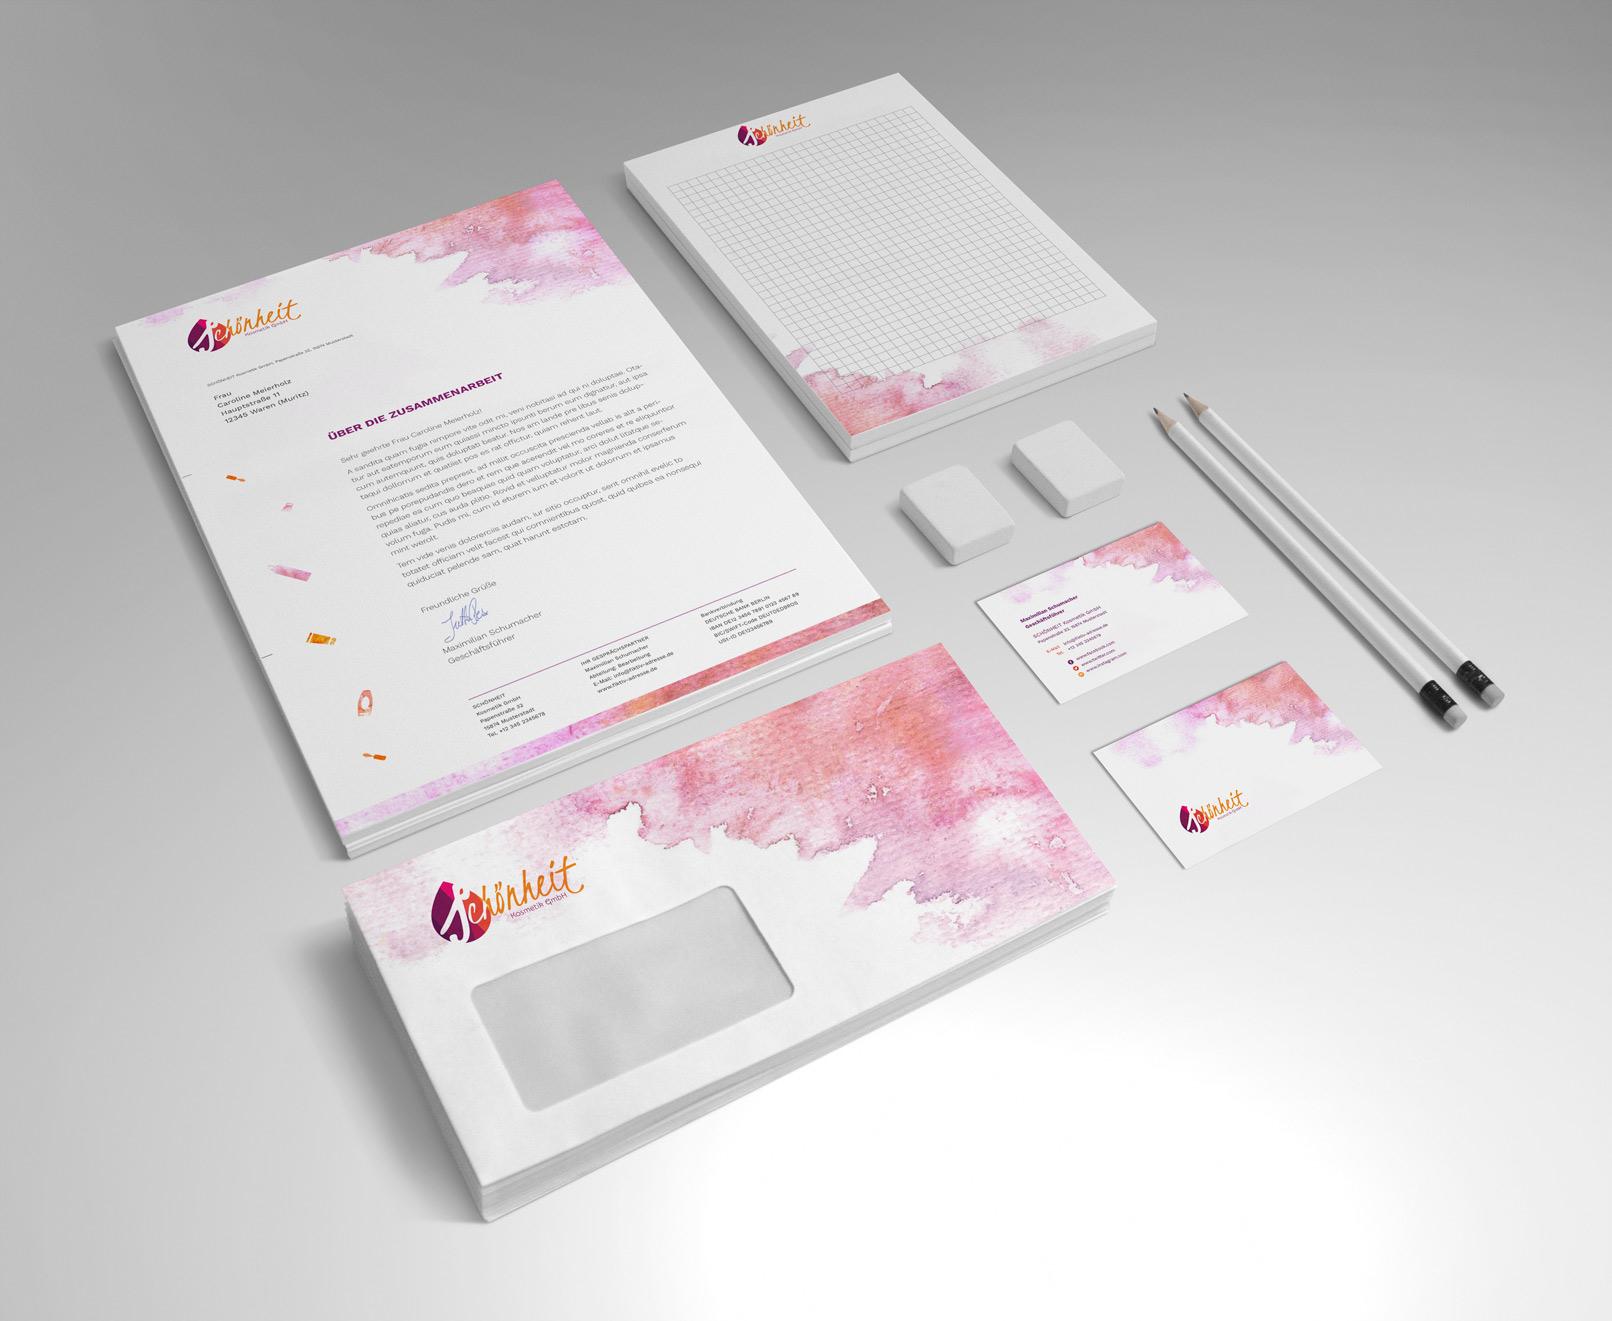 PSD-Mockup mit Briefpapier, Visitenkarte, Block